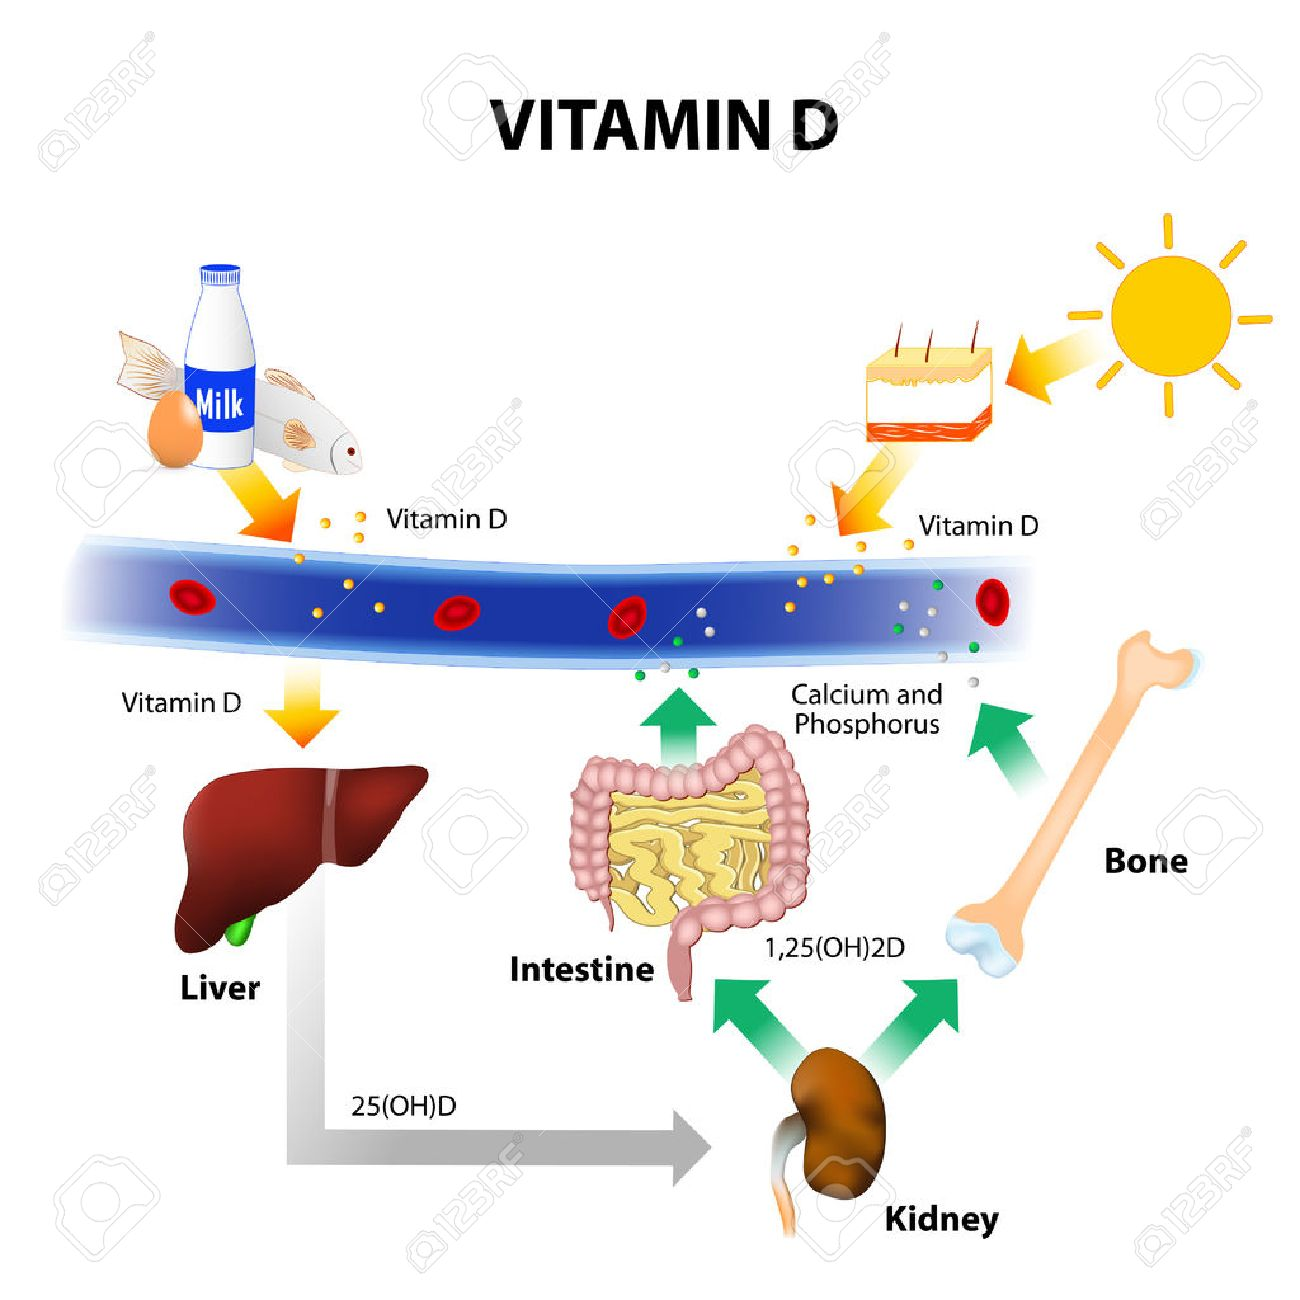 Vitamin D Foods Contain Skin Absorbs Solar Uvb Radiation. Vector Vitamin D Foods Contain Skin Absorbs Solar Uvb Radiation And Synthesis Of Calcium Homeostasis Metabolism. Wiring. Homeostasis Diagram Of Vit D At Scoala.co